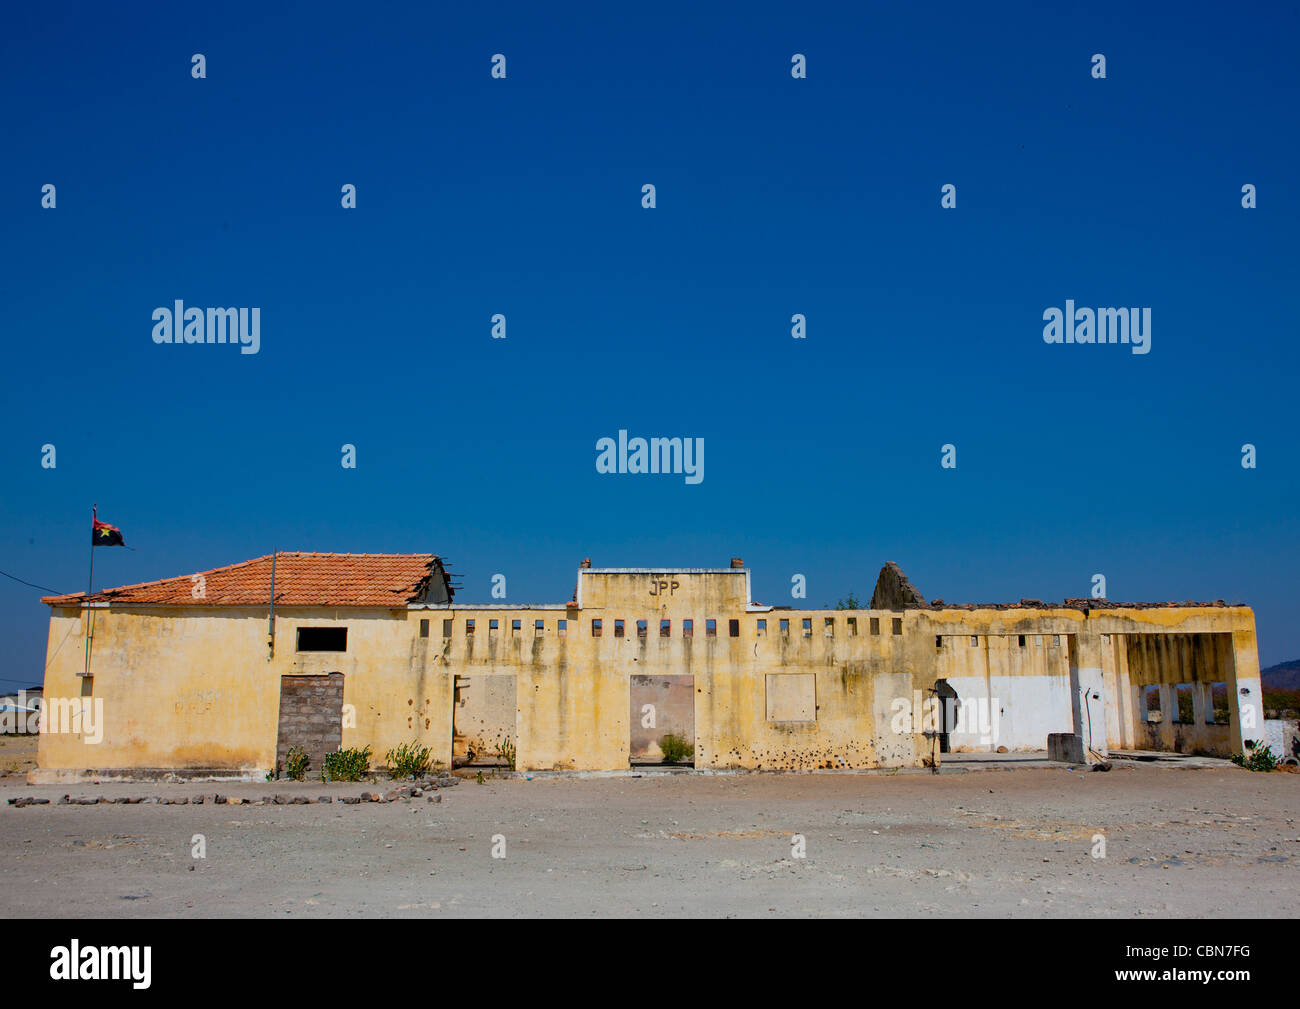 Ruins Of The Village Of Chitado After The Civil War, Angola - Stock Image